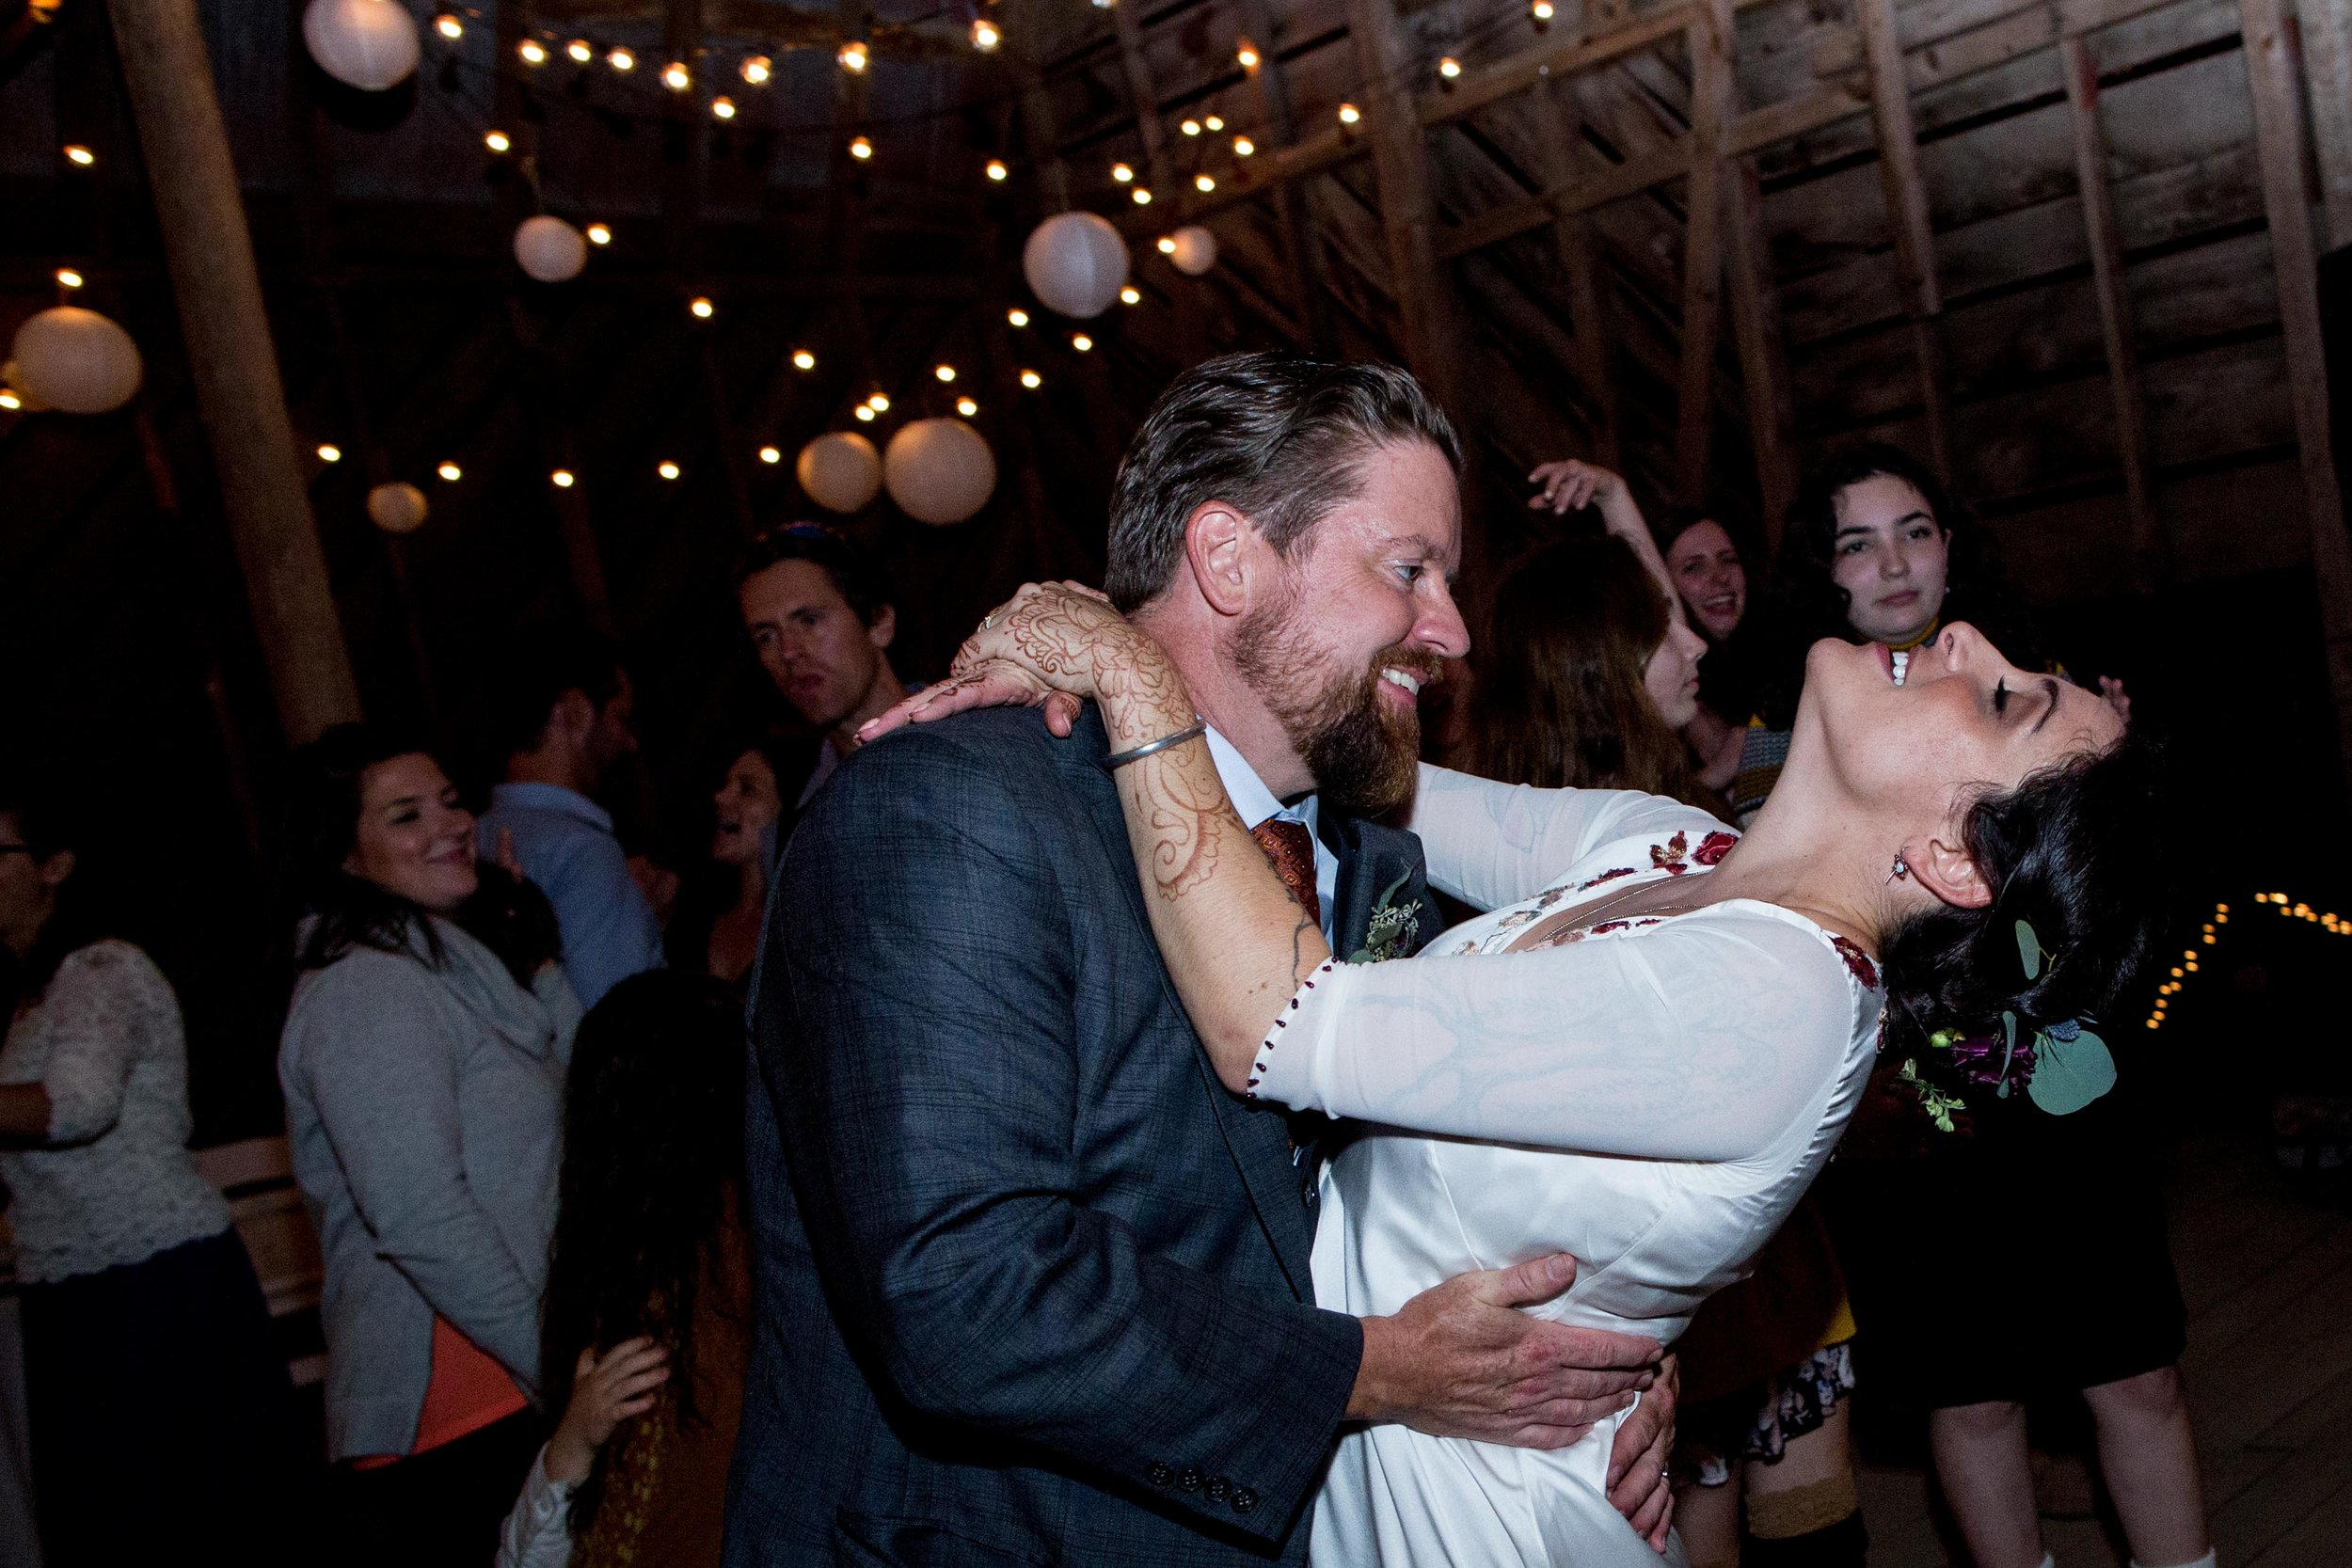 Jane Kramer + Jason Sandford Ashevegas wedding best photographer WNC -77.jpg